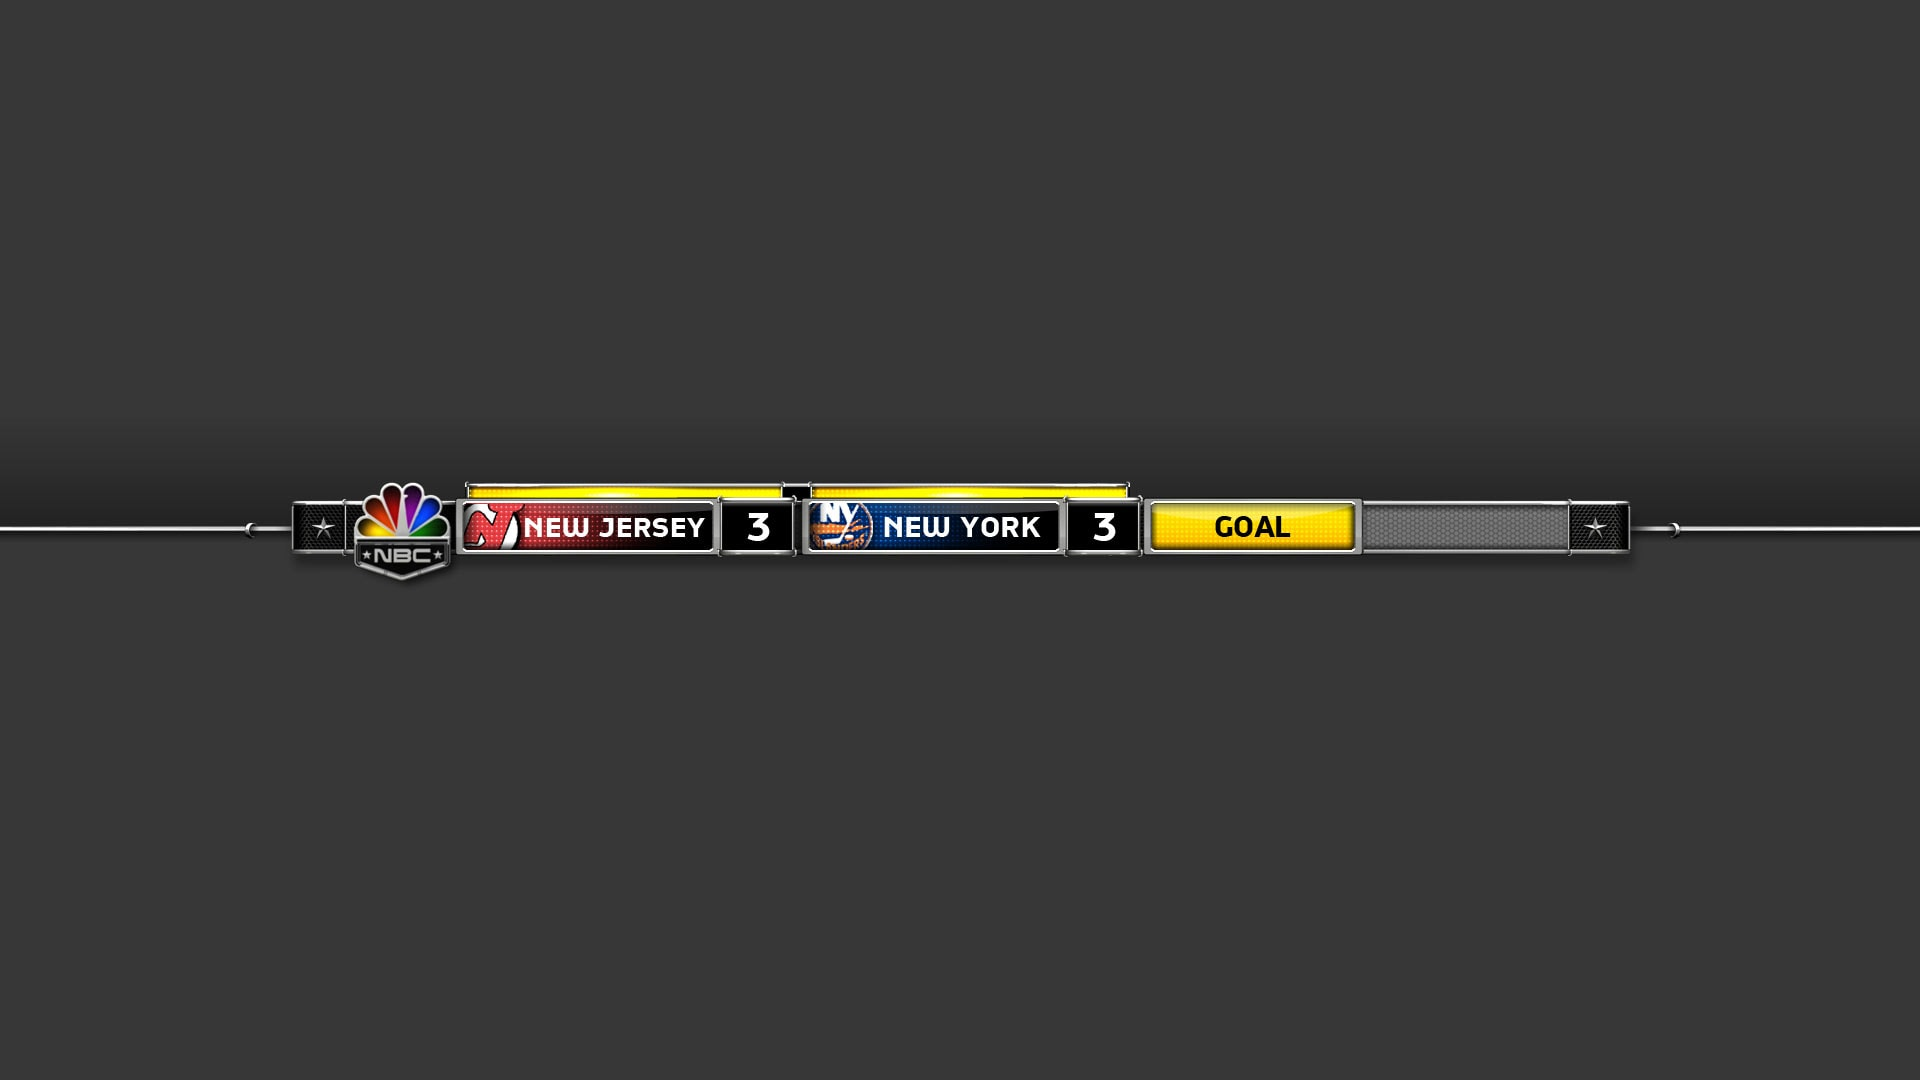 NHL-scorebar-victor-ruano-4